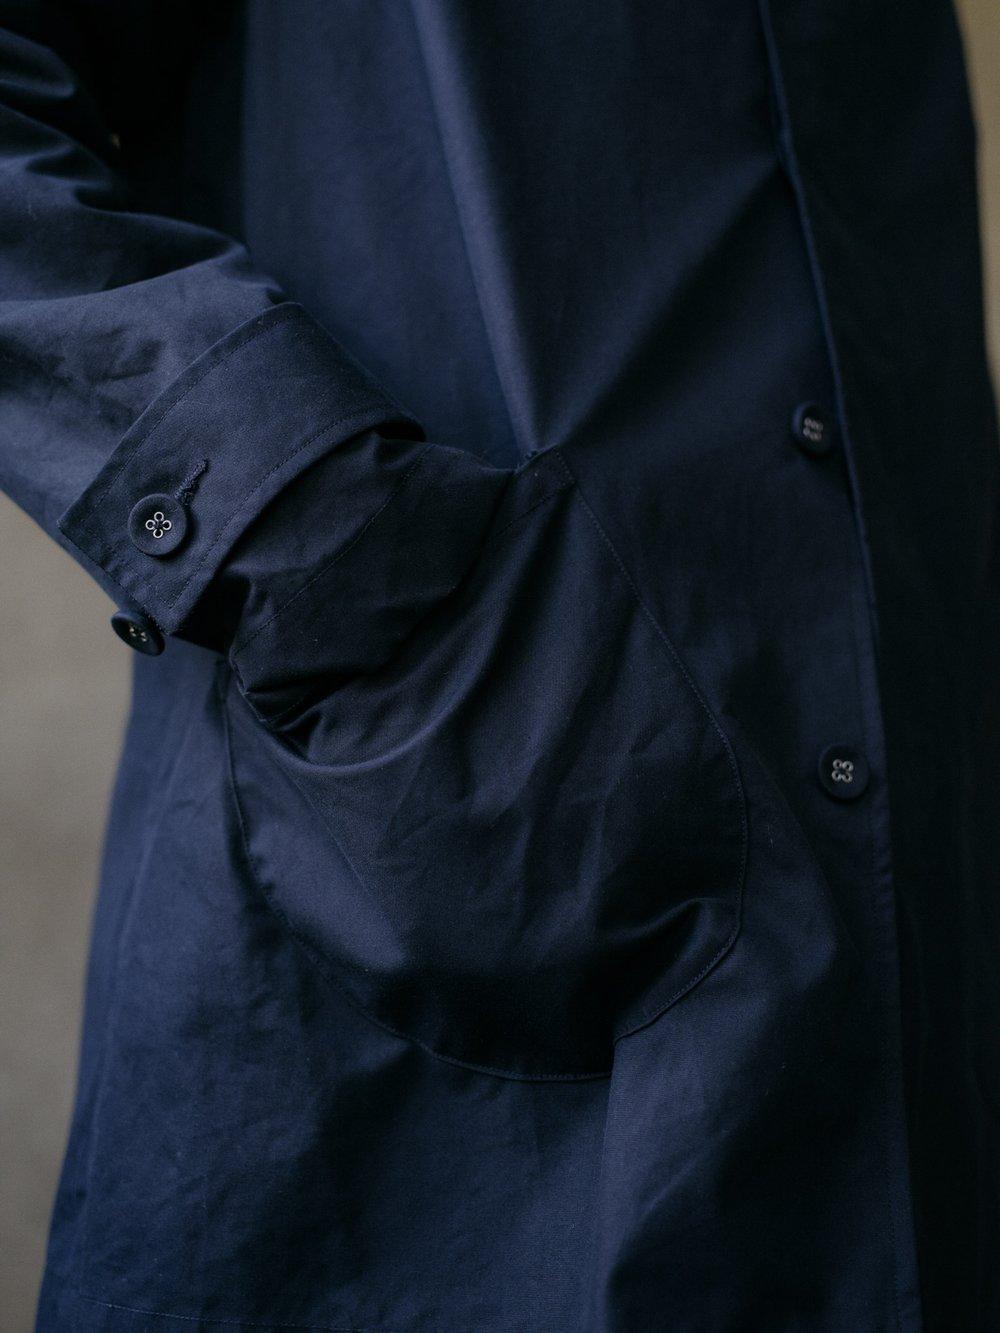 evan-kinori-covered-placket-coat-black-ventile-2